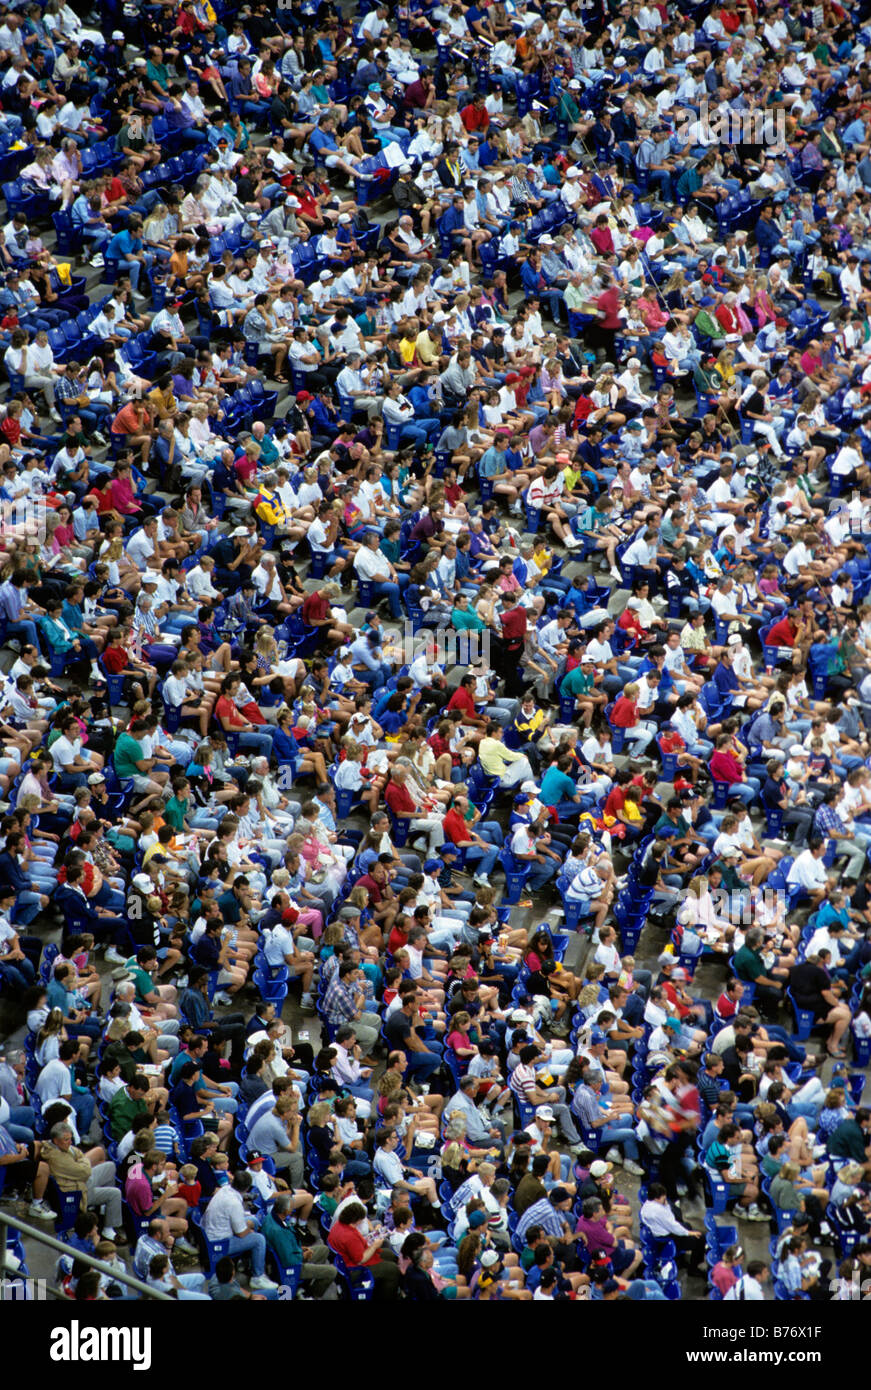 "Vista aérea de la multitud de espectadores en gemelos"" juego de baseball en Minneapolis, Minnesota. Foto de stock"